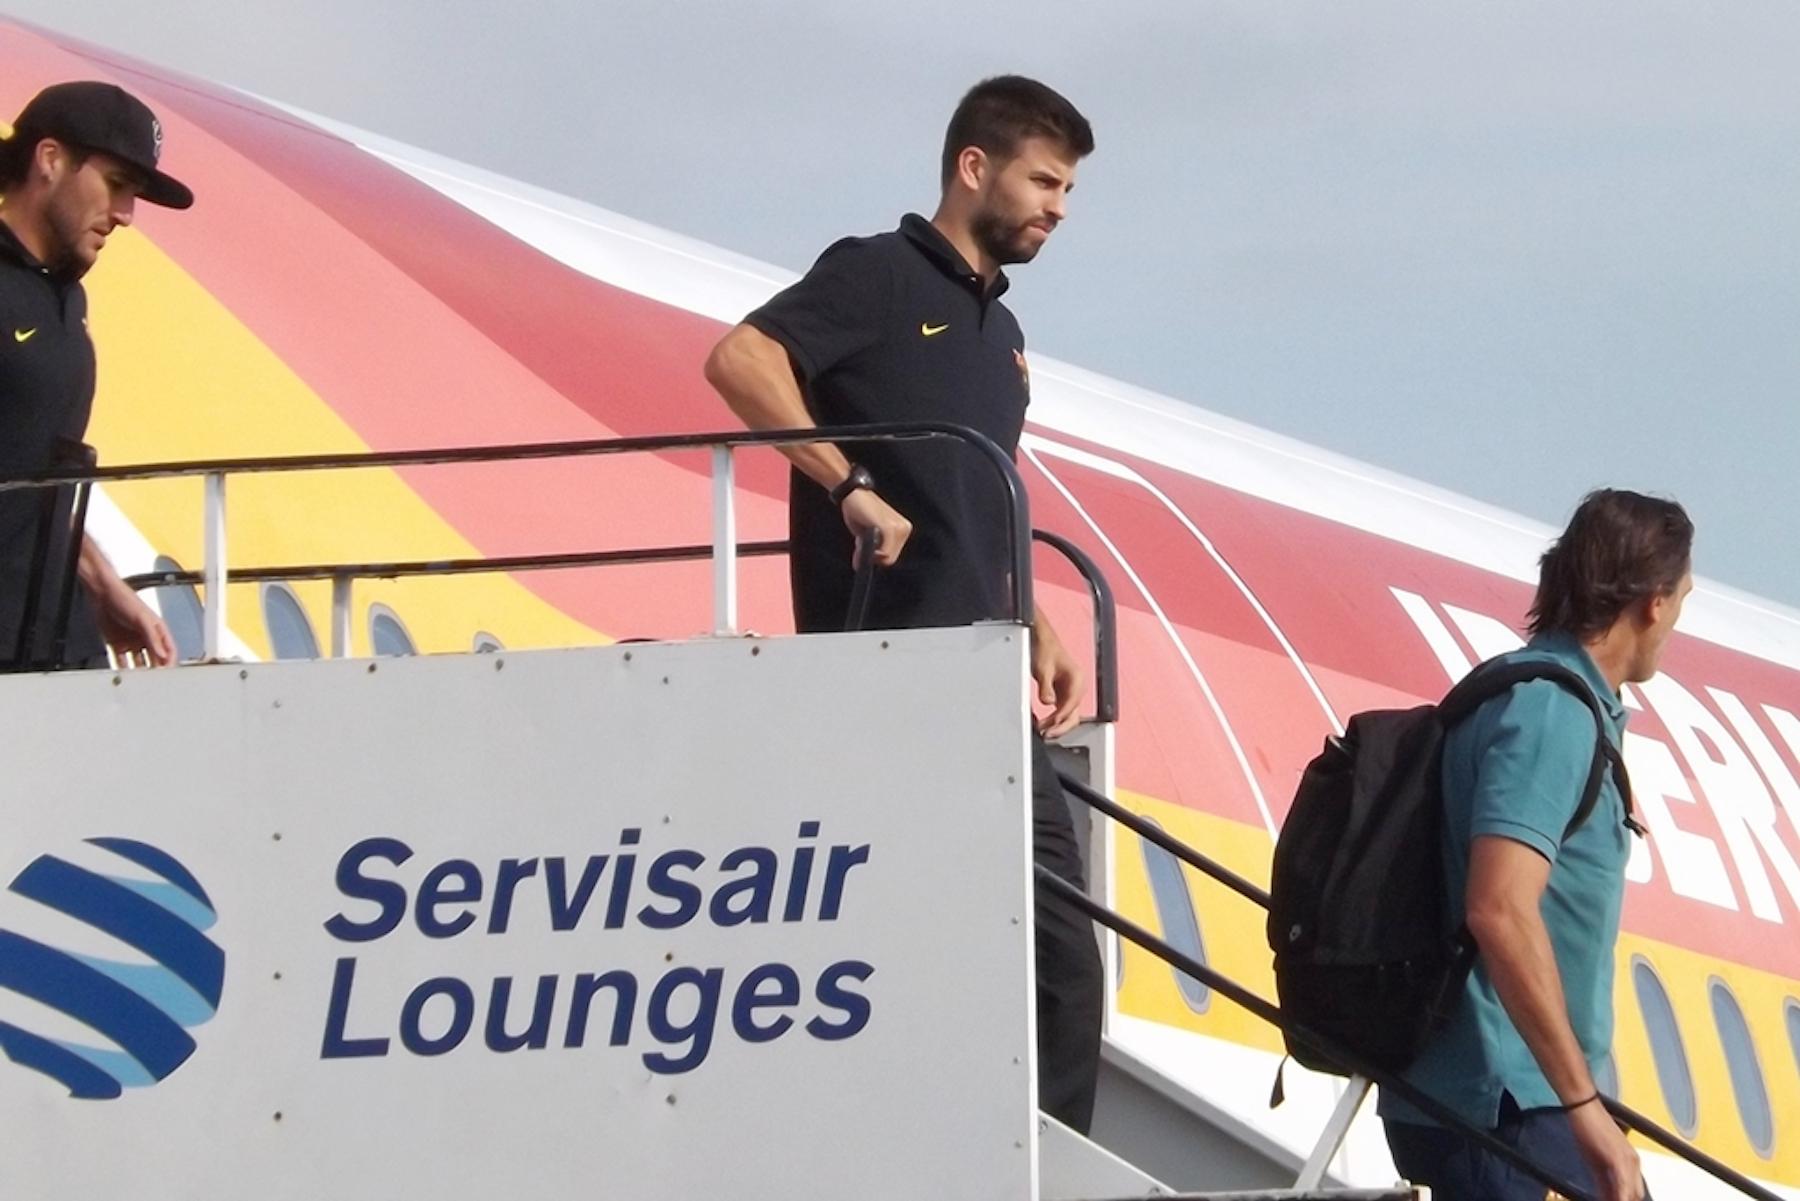 Gerard Pique getting off plane